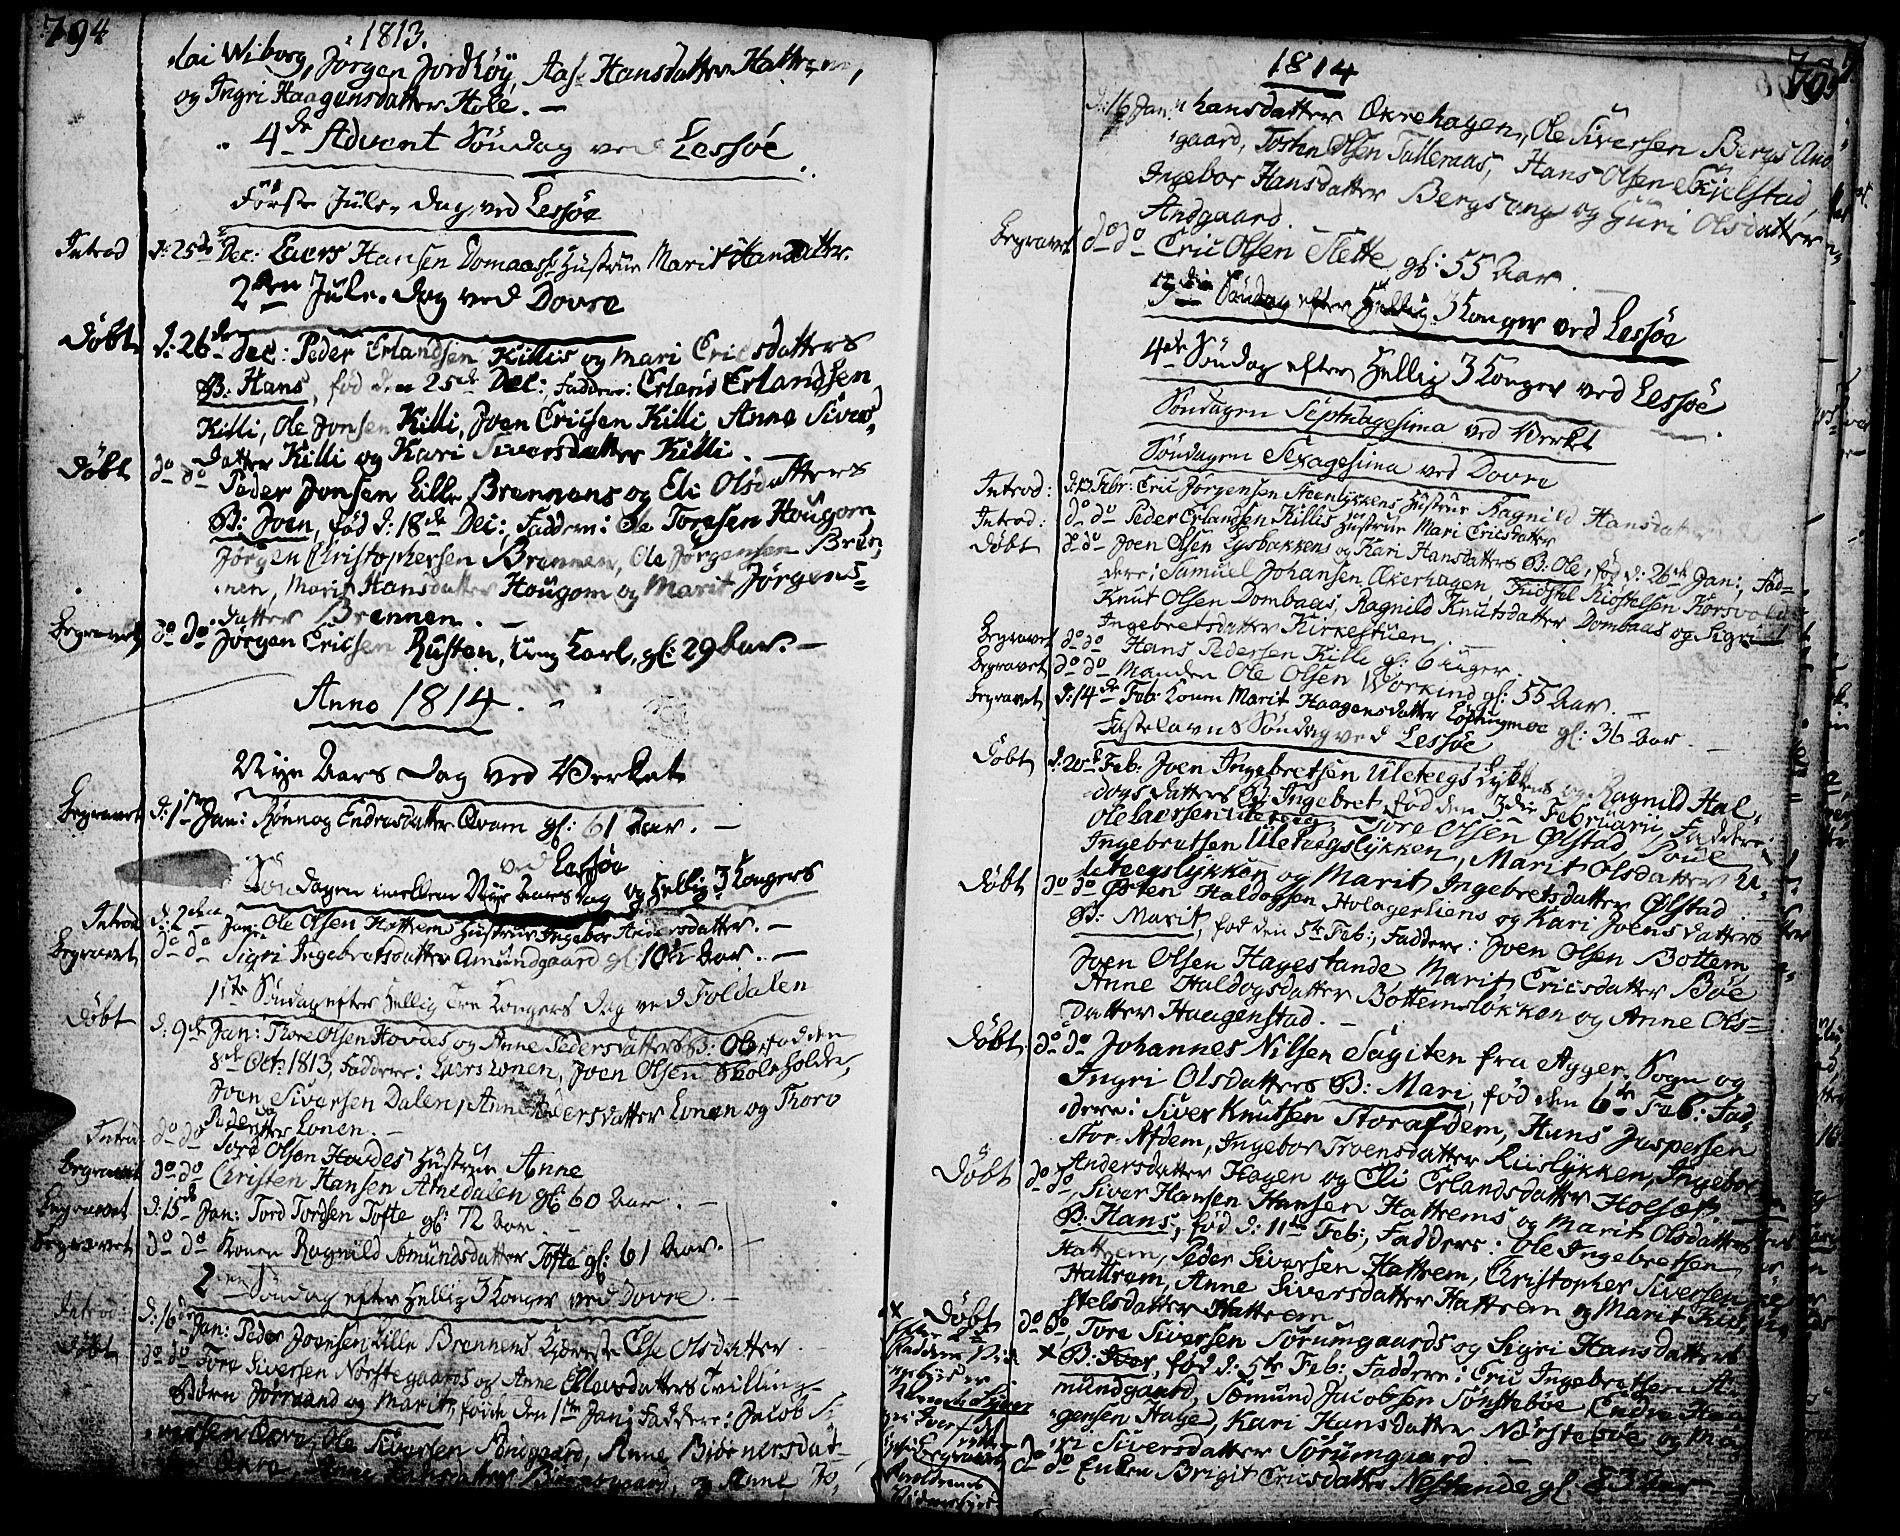 SAH, Lesja prestekontor, Ministerialbok nr. 3, 1777-1819, s. 794-795